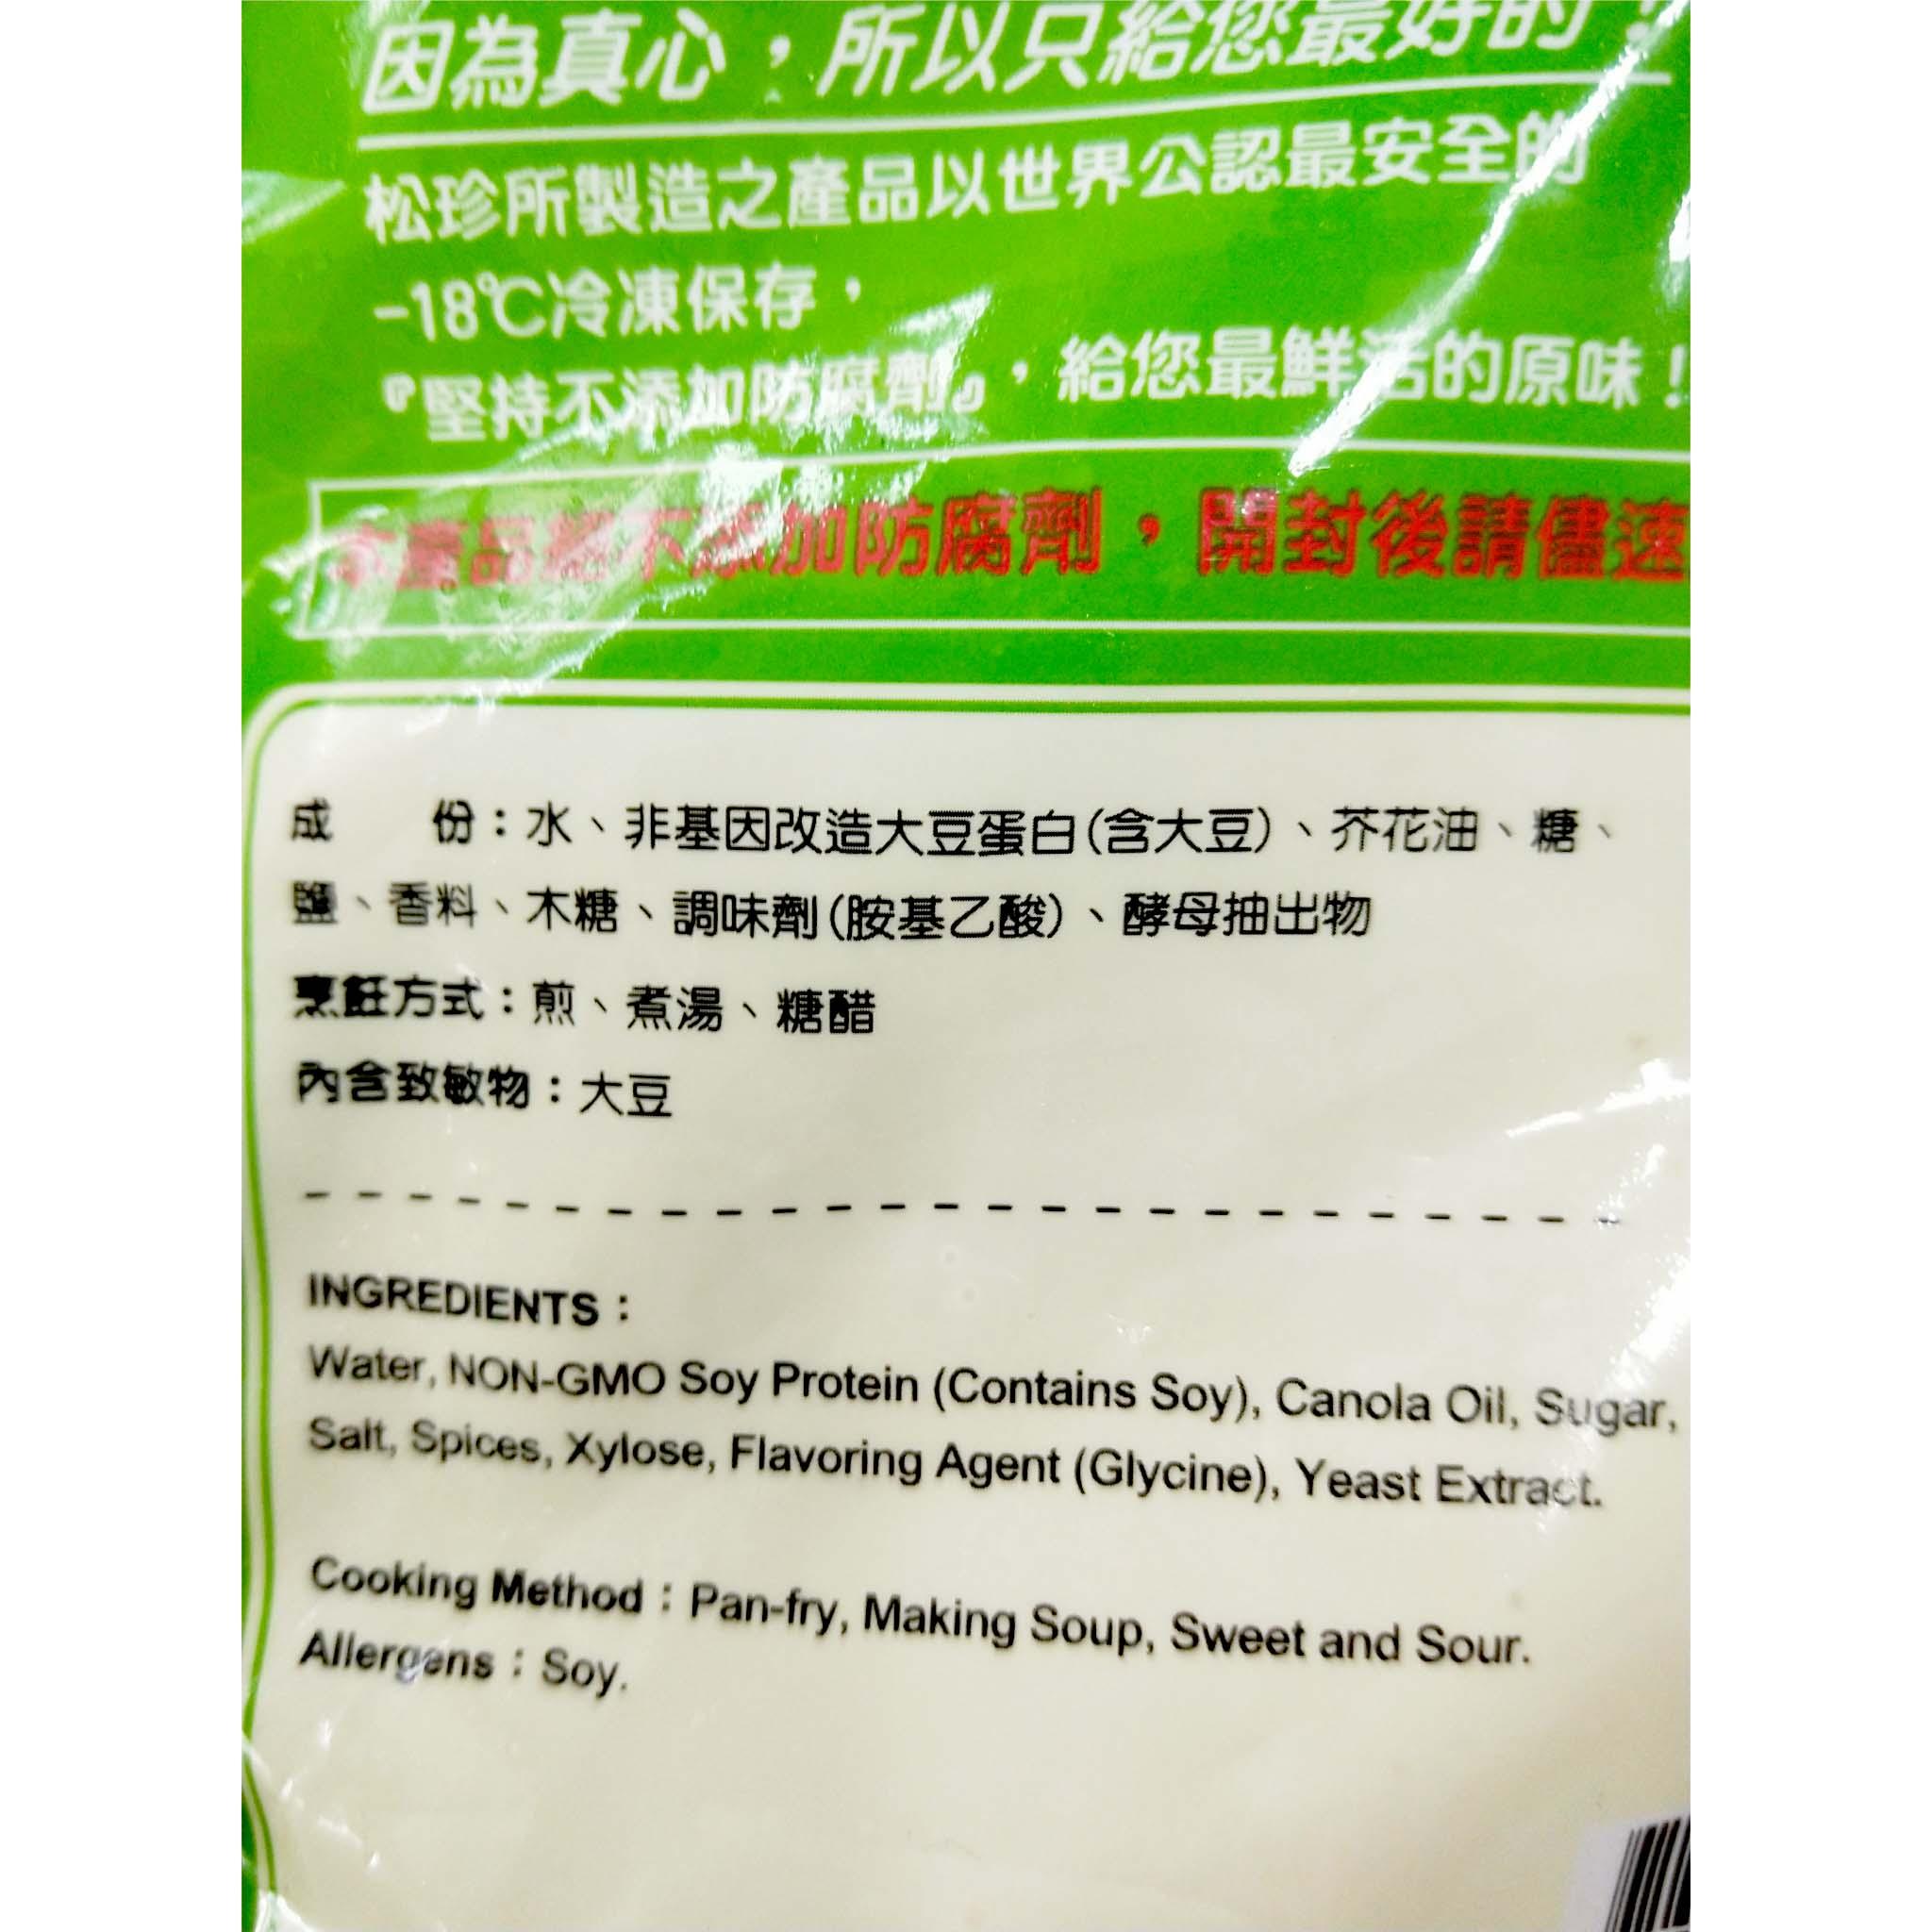 Image Vegefarm Fish Tofu 松珍-珍香鱼豆腐 454grams